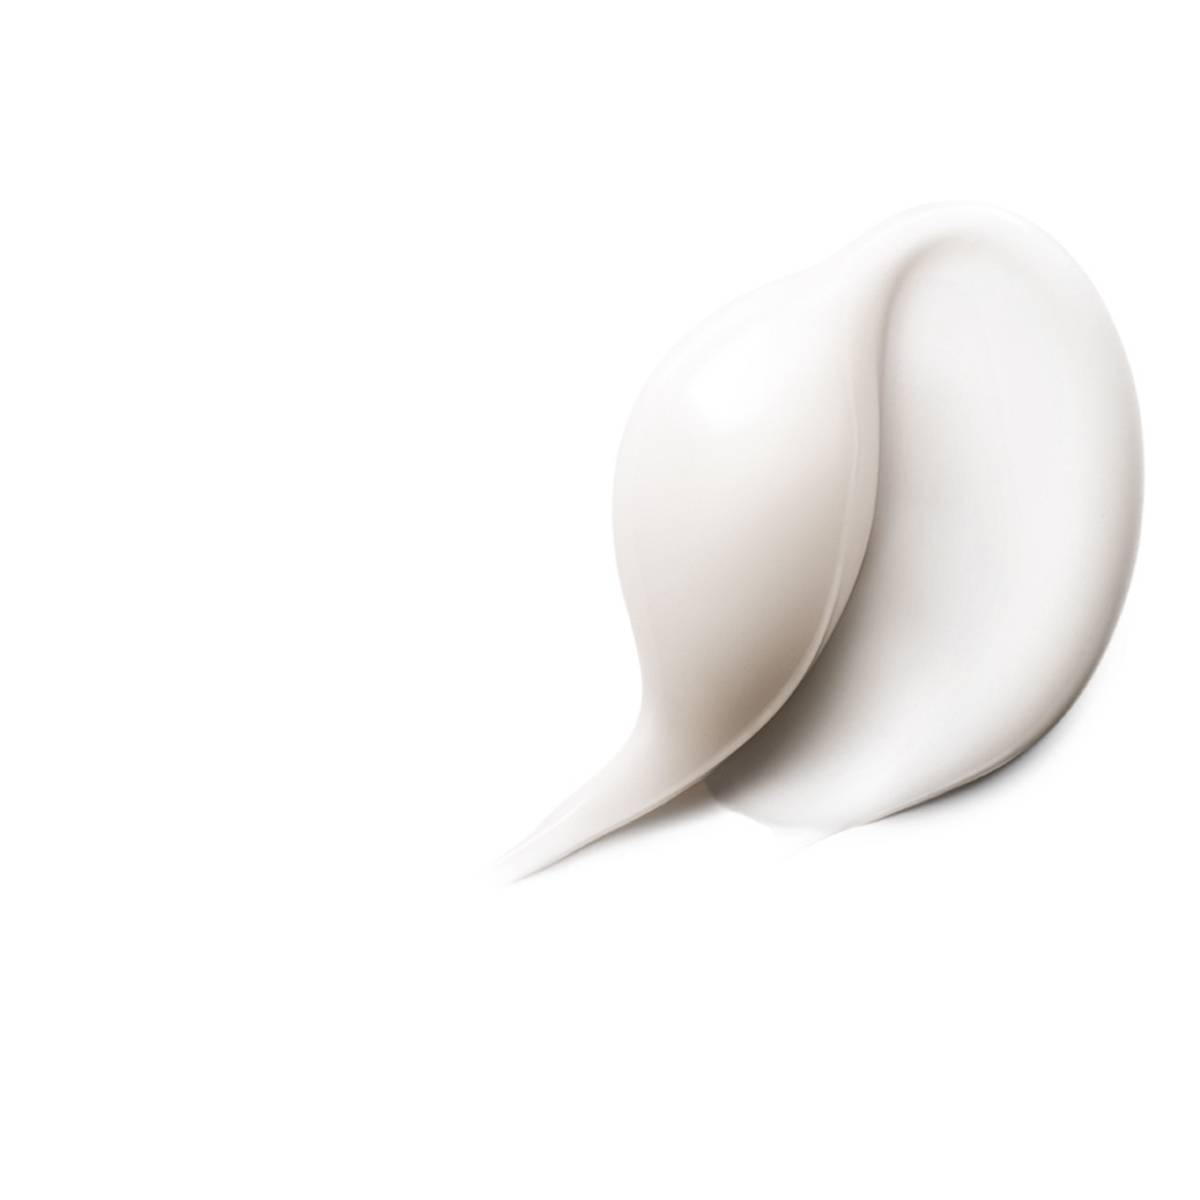 La Roche Posay ProductPage Anti Aging Hyalu B5 Cream Texture